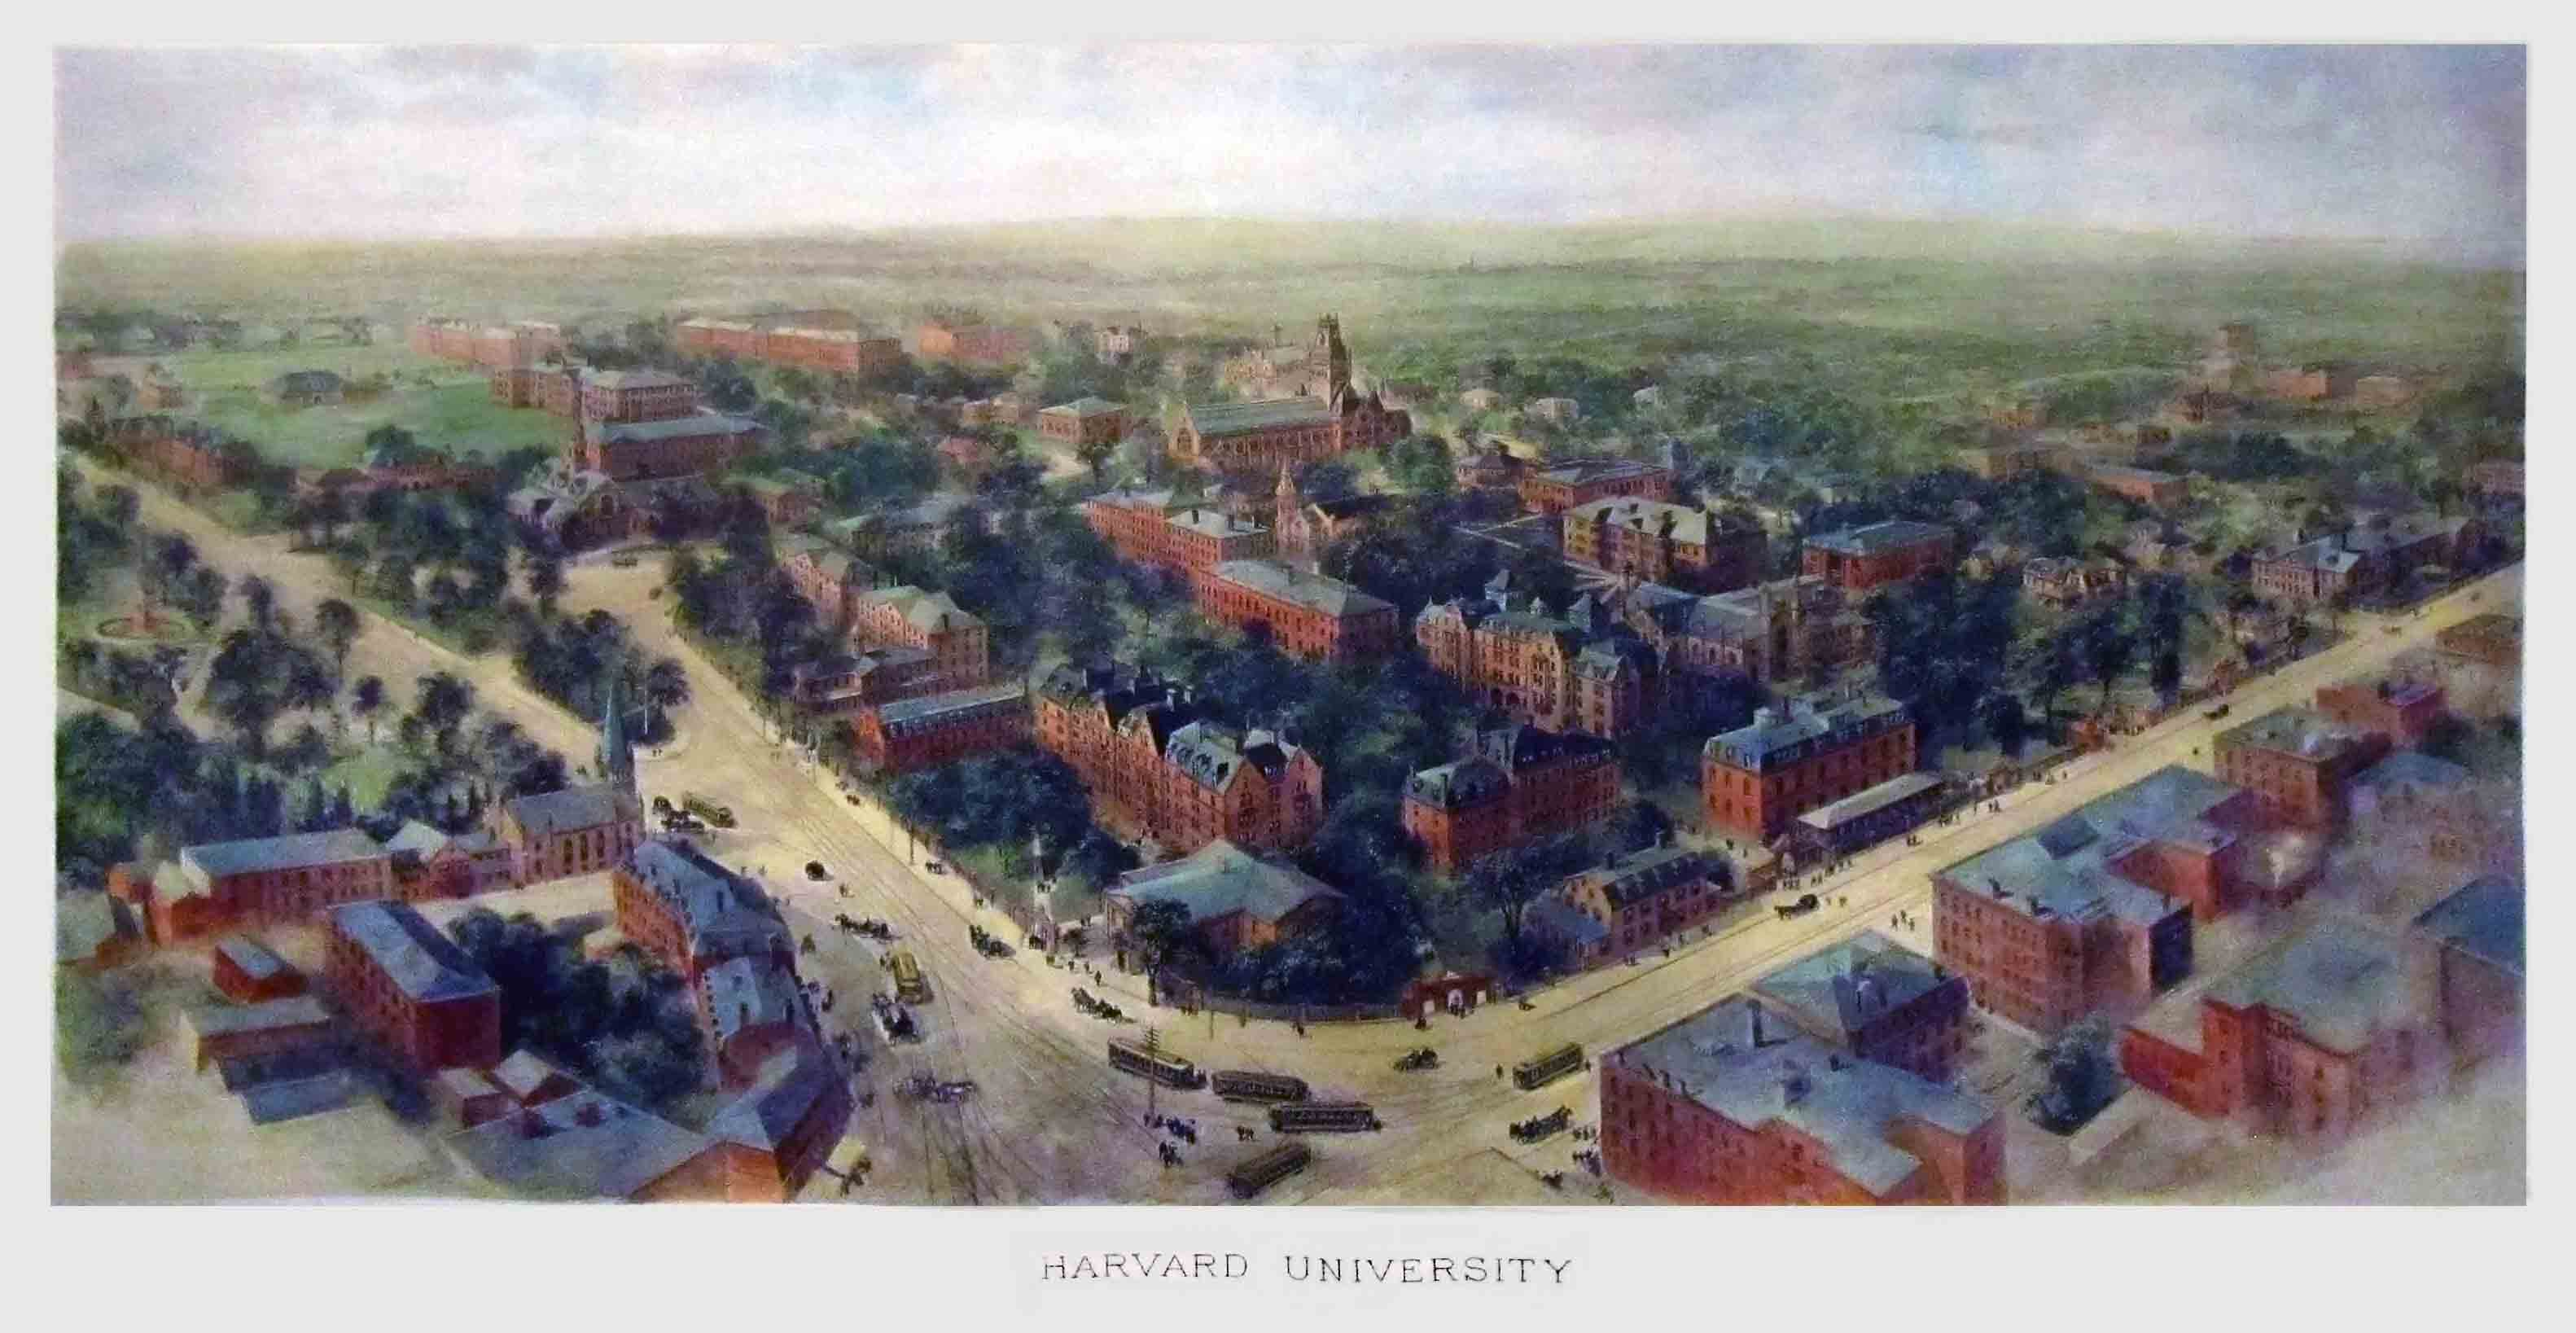 Harvard admissions essay question